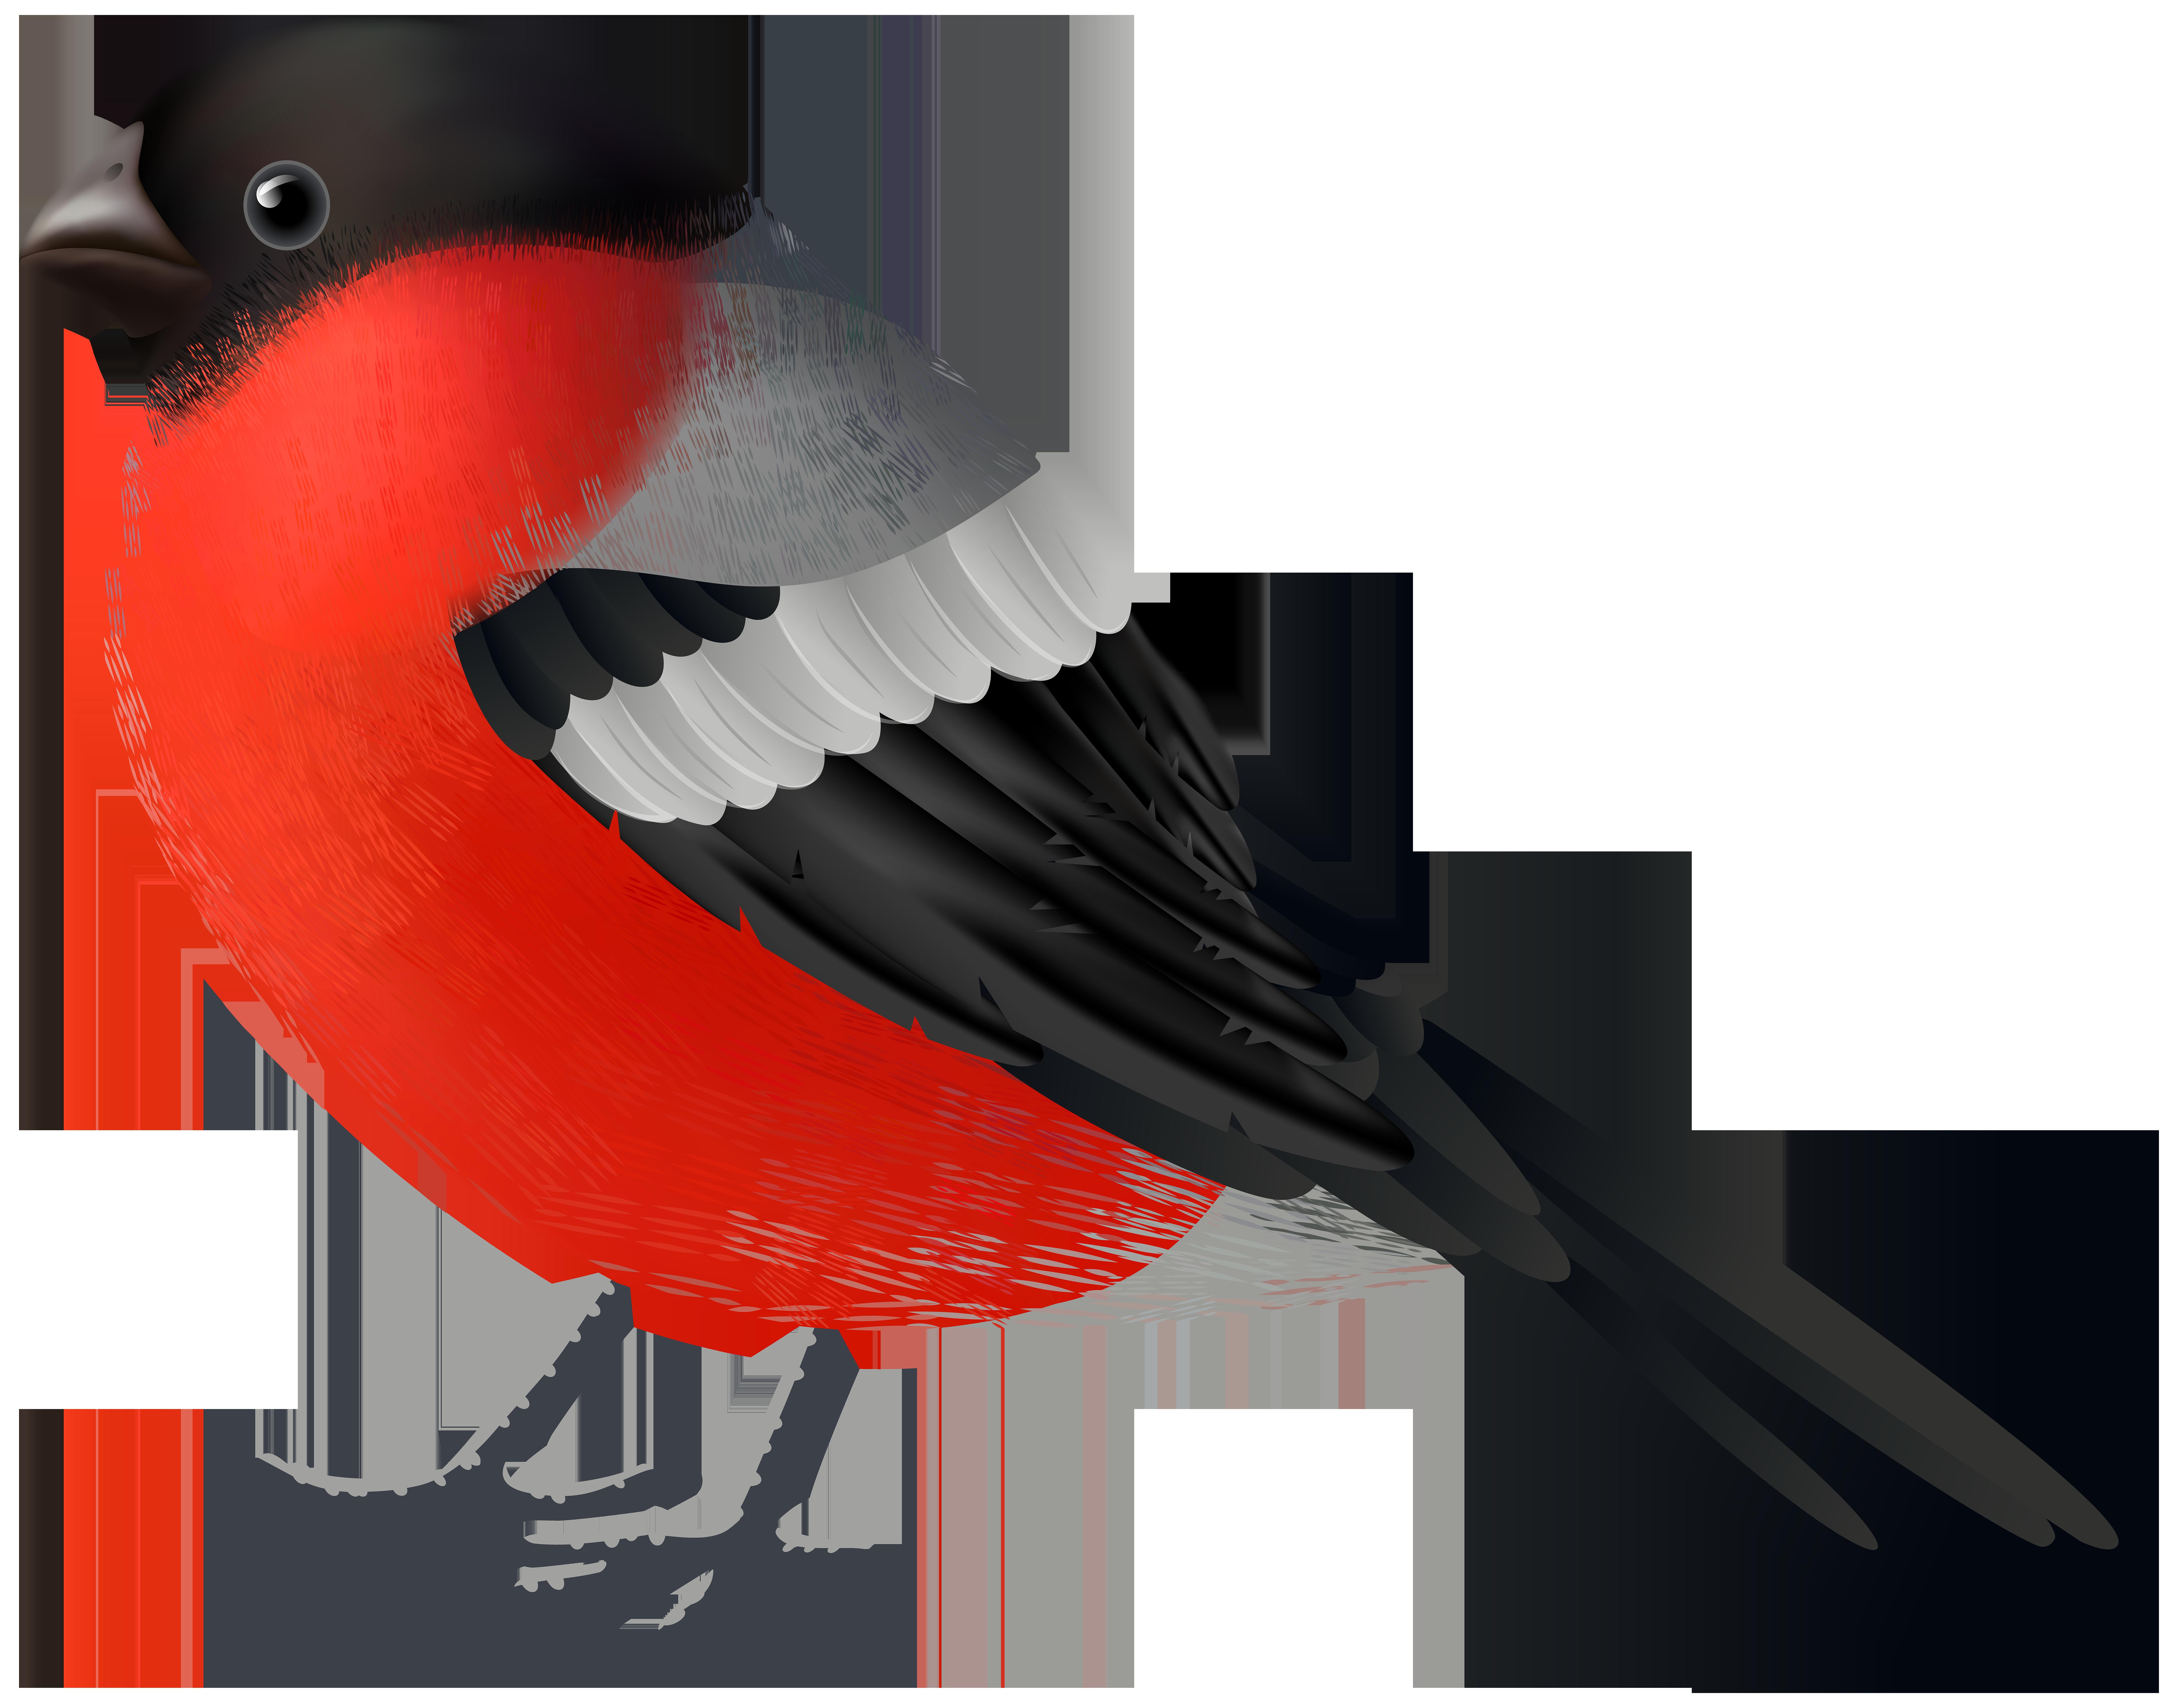 Red and black clipart svg black and white stock Unique Black Bird Clip Art File Free ~ Vector Images Design svg black and white stock